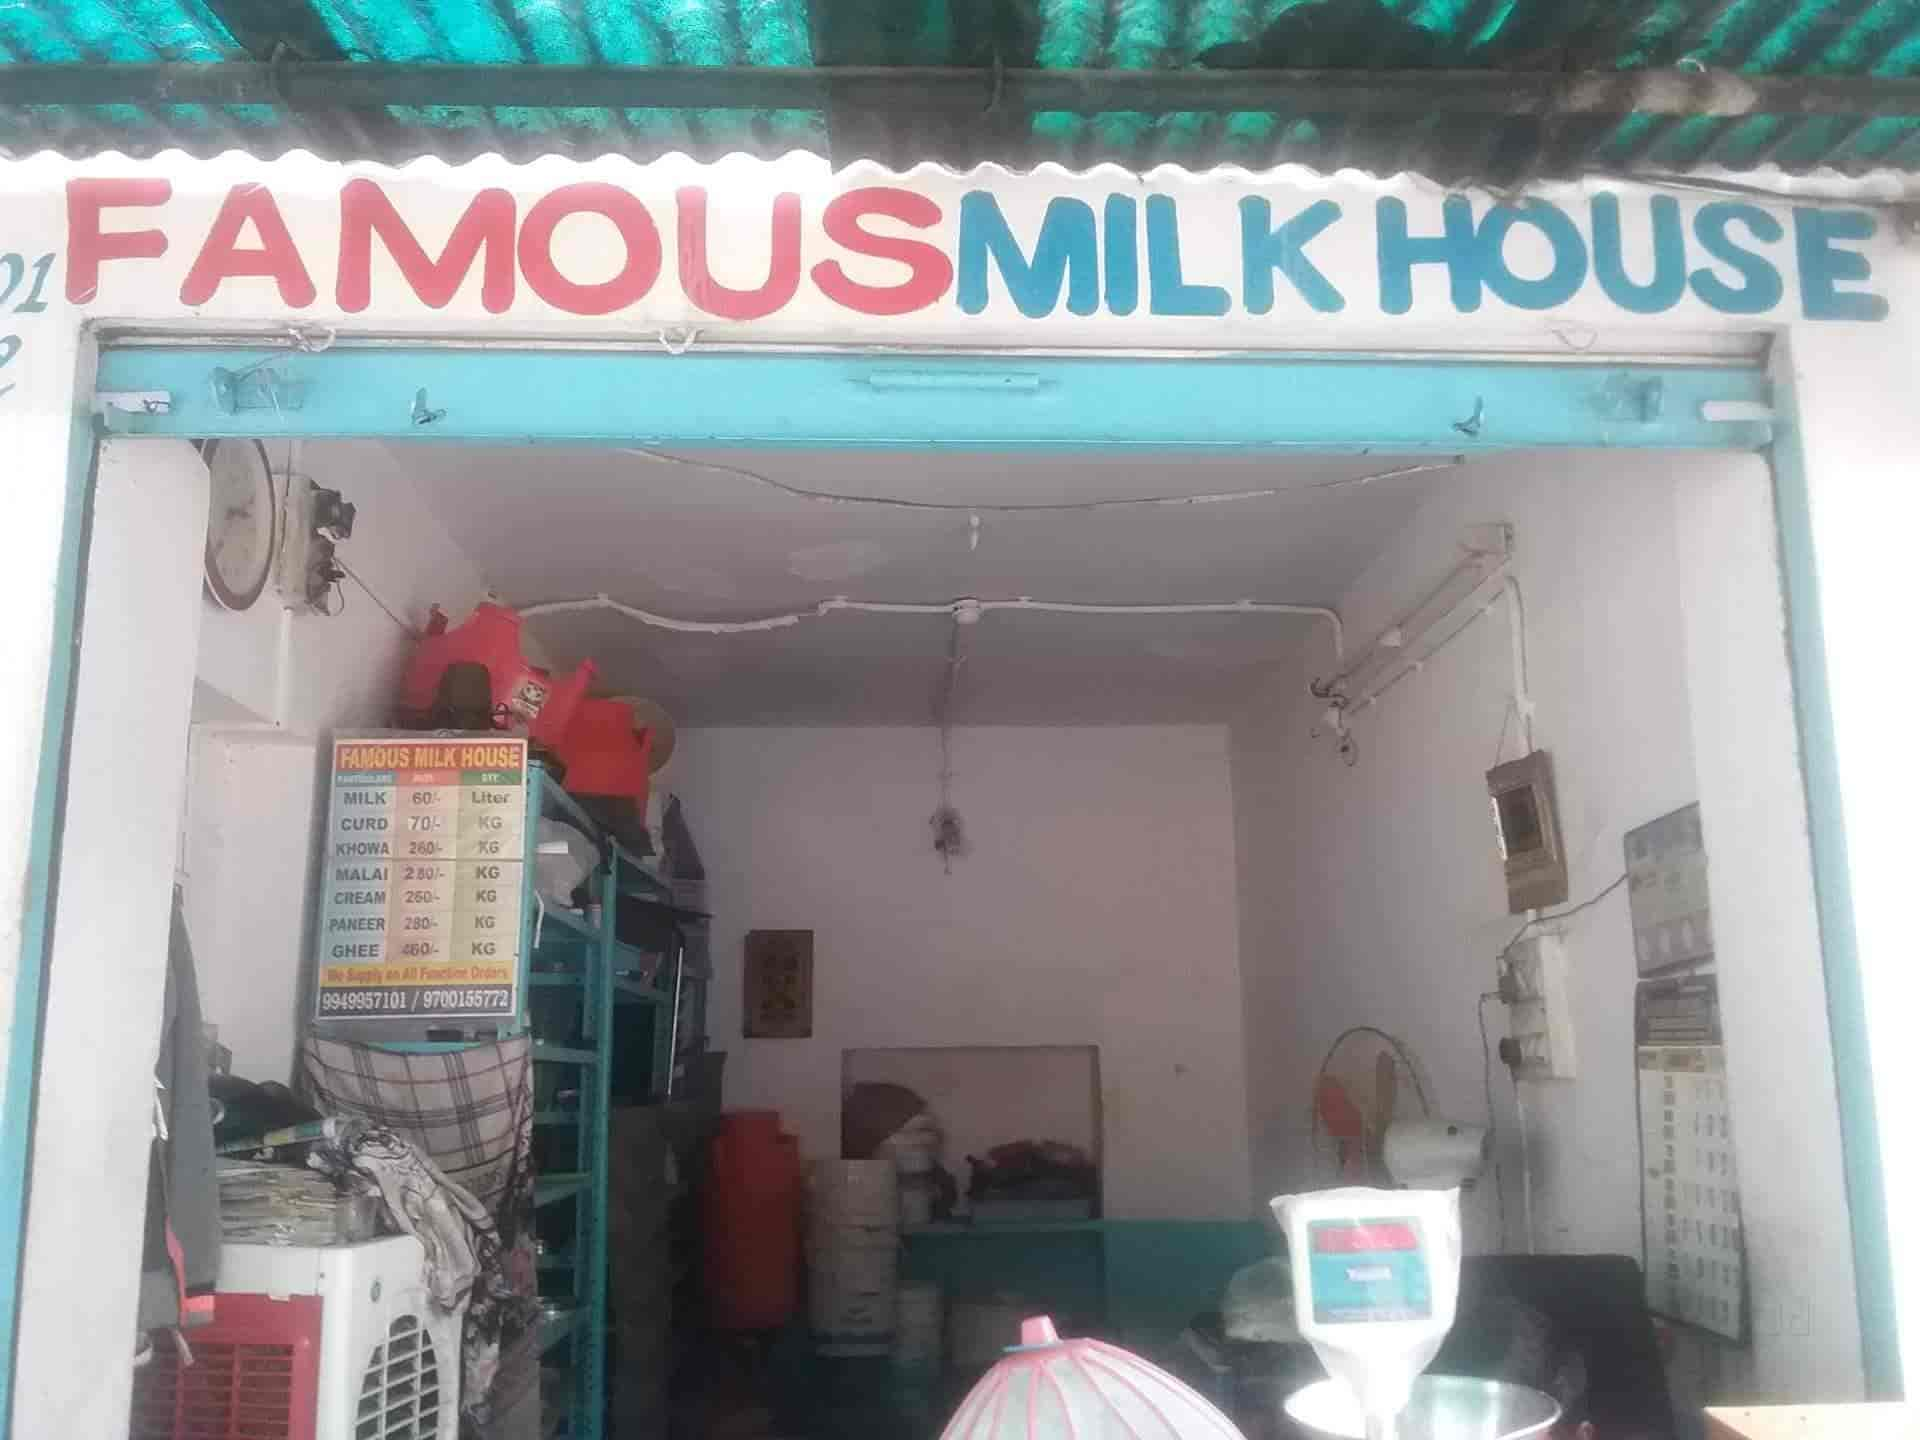 Famous Milk House Mehdipatnam Milk Dairy In Hyderabad